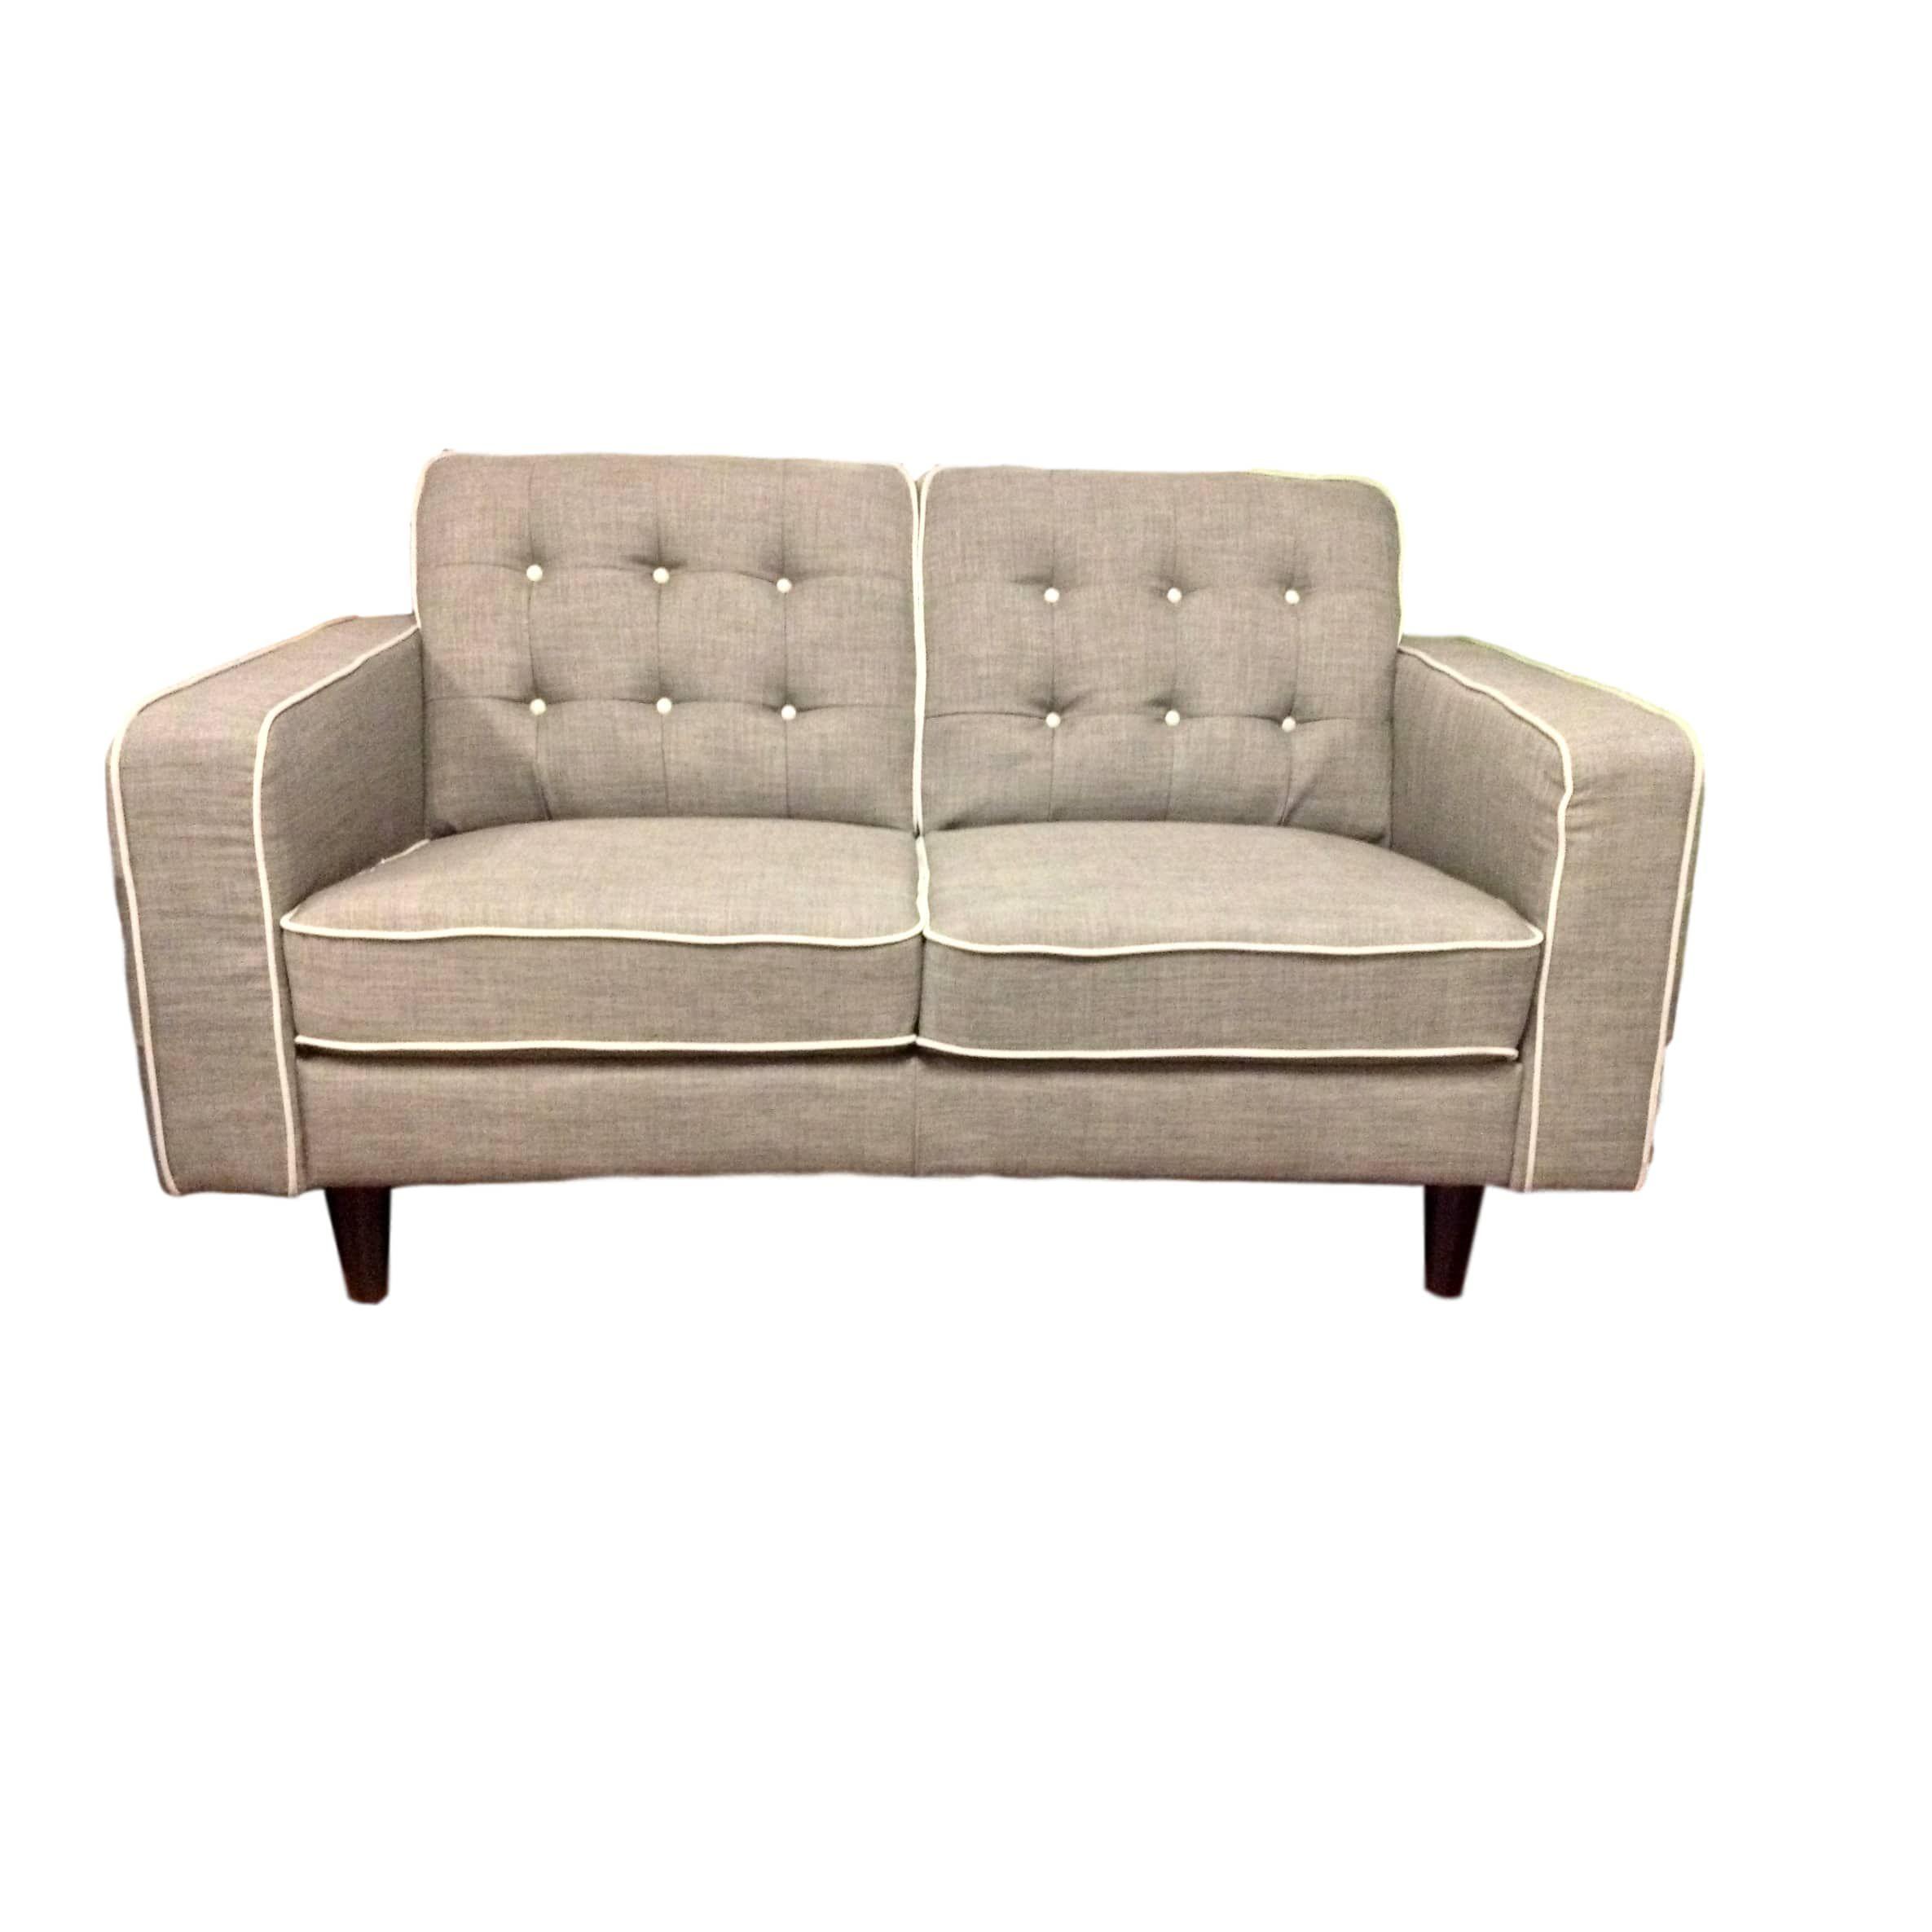 Fresh Grey Sofa Wooden Legs Fresh Grey Sofa Wooden Legs 56 For Your Sofa Design Ideas With Grey Sectional Sofa With Recliner Contemporary Sofa Nailhead Sofa